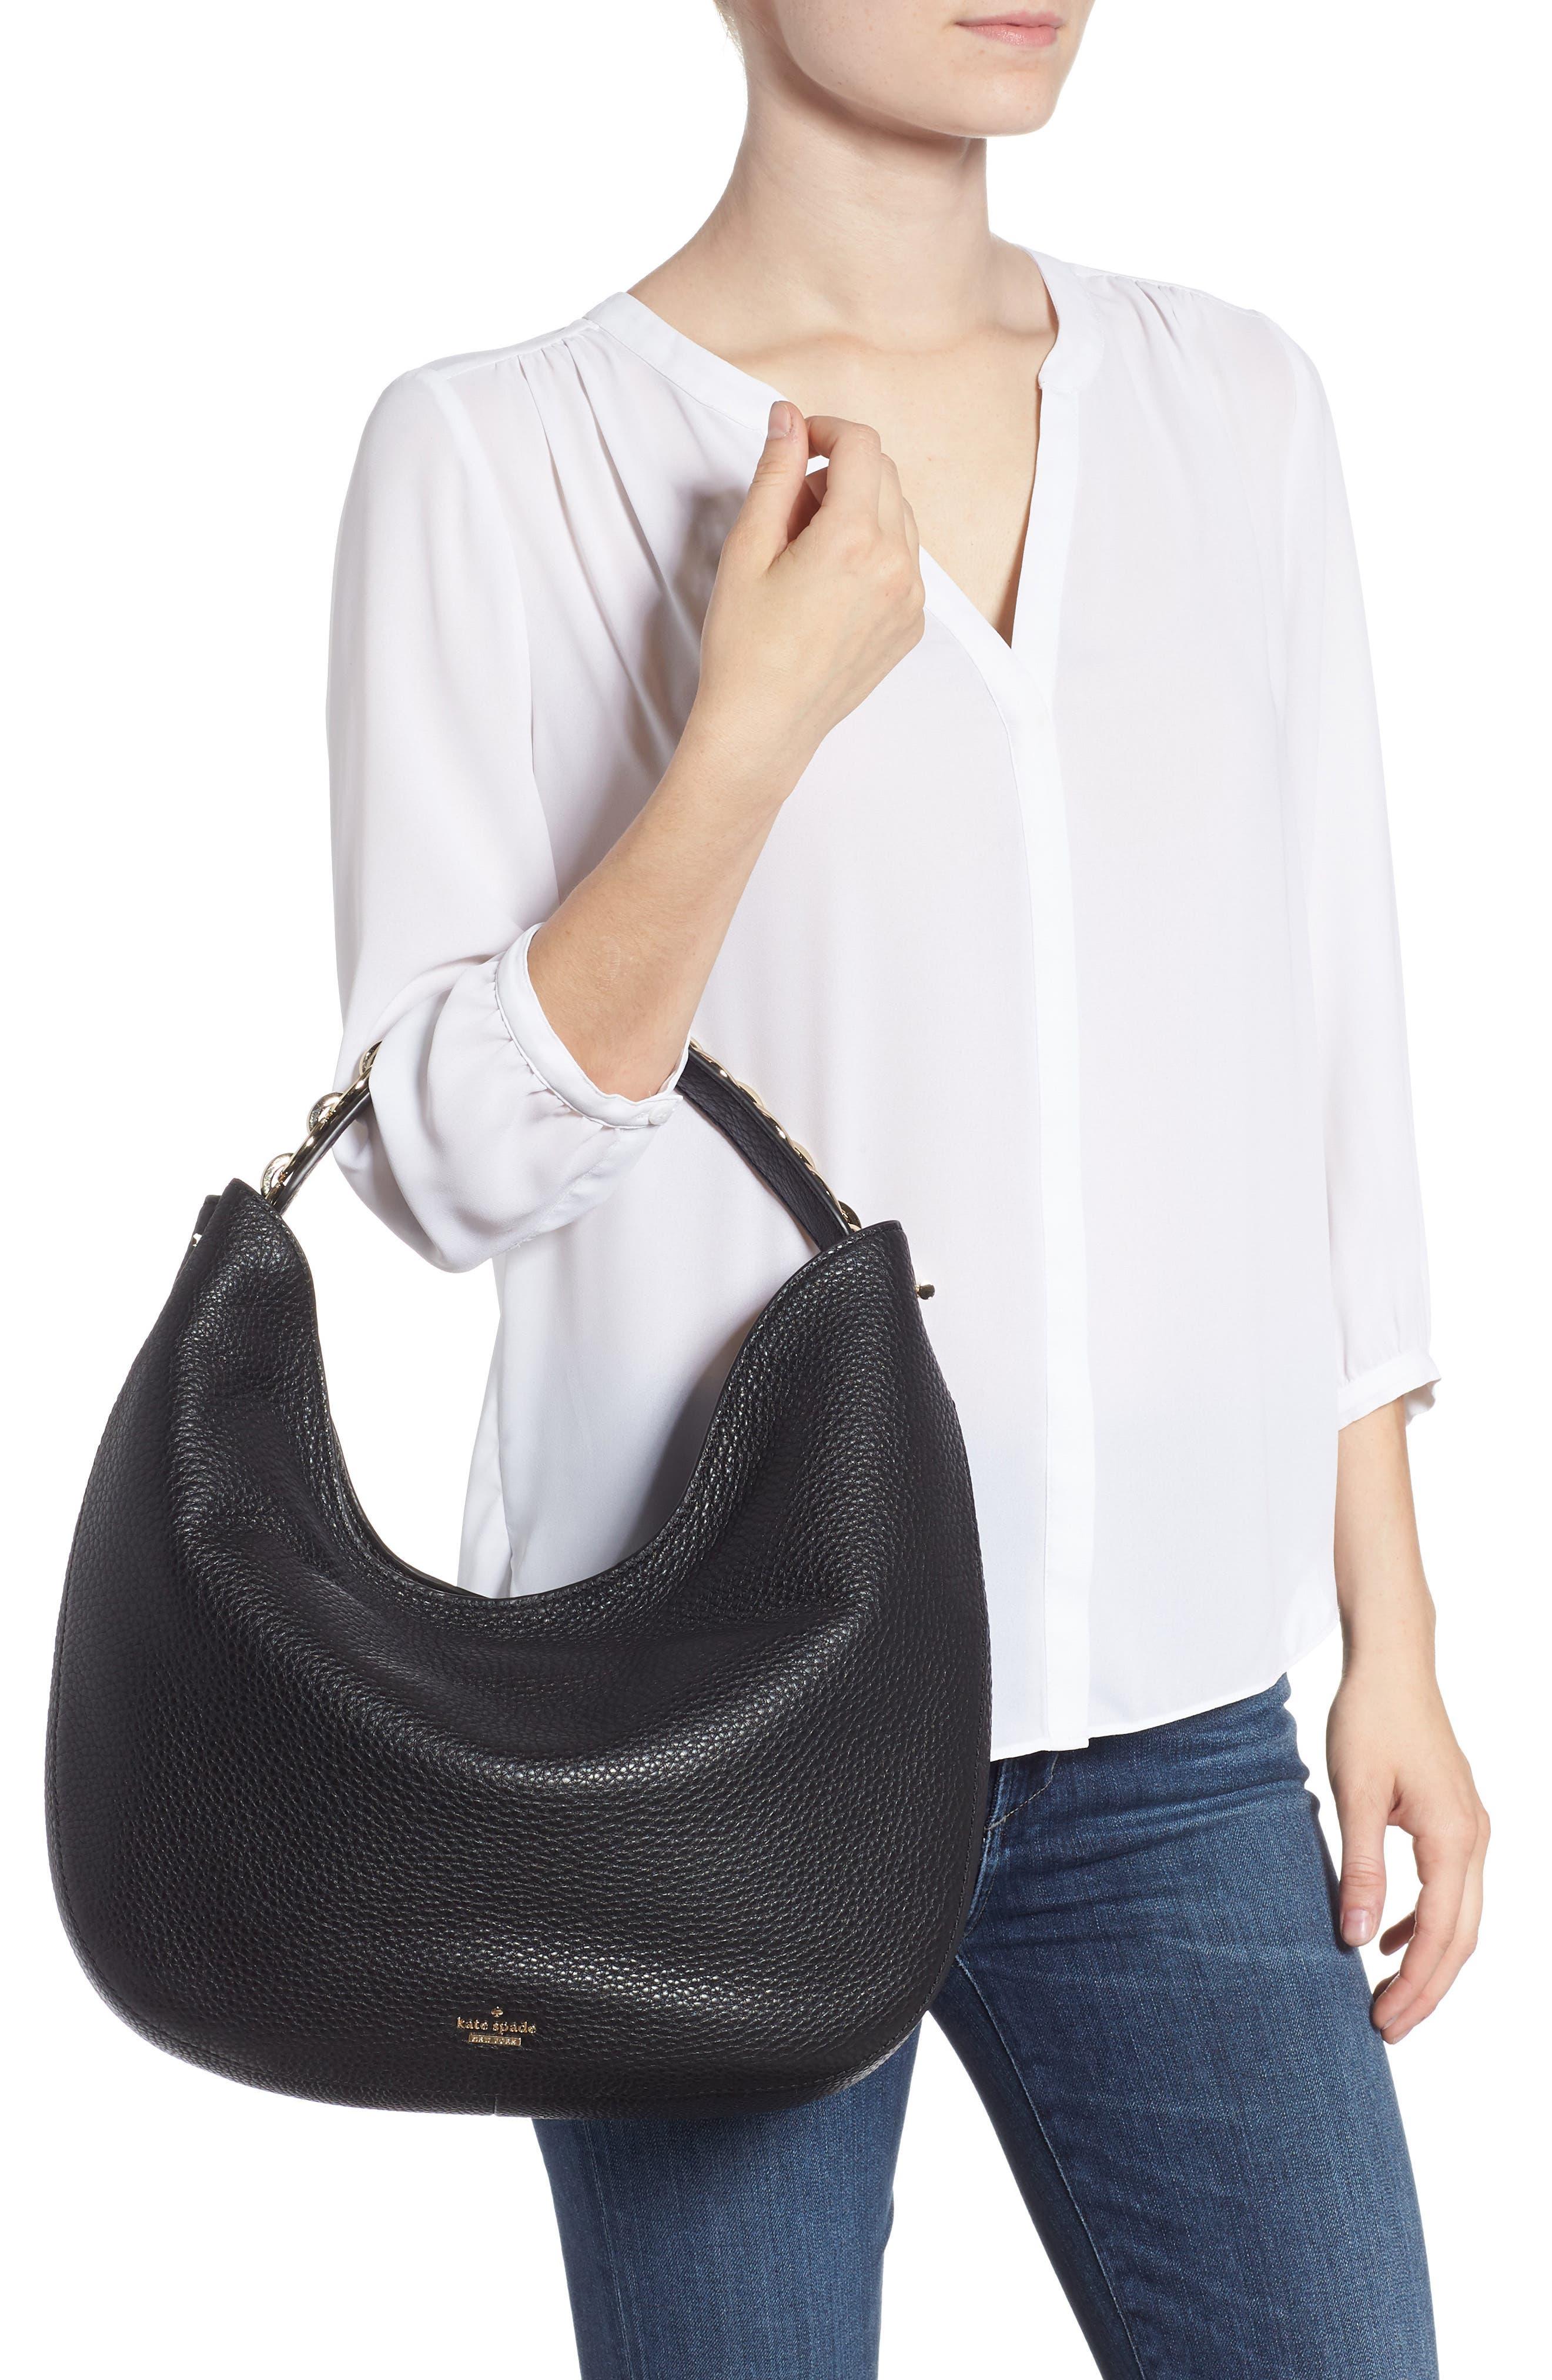 murray street heather pebbled leather hobo bag,                             Alternate thumbnail 2, color,                             BLACK